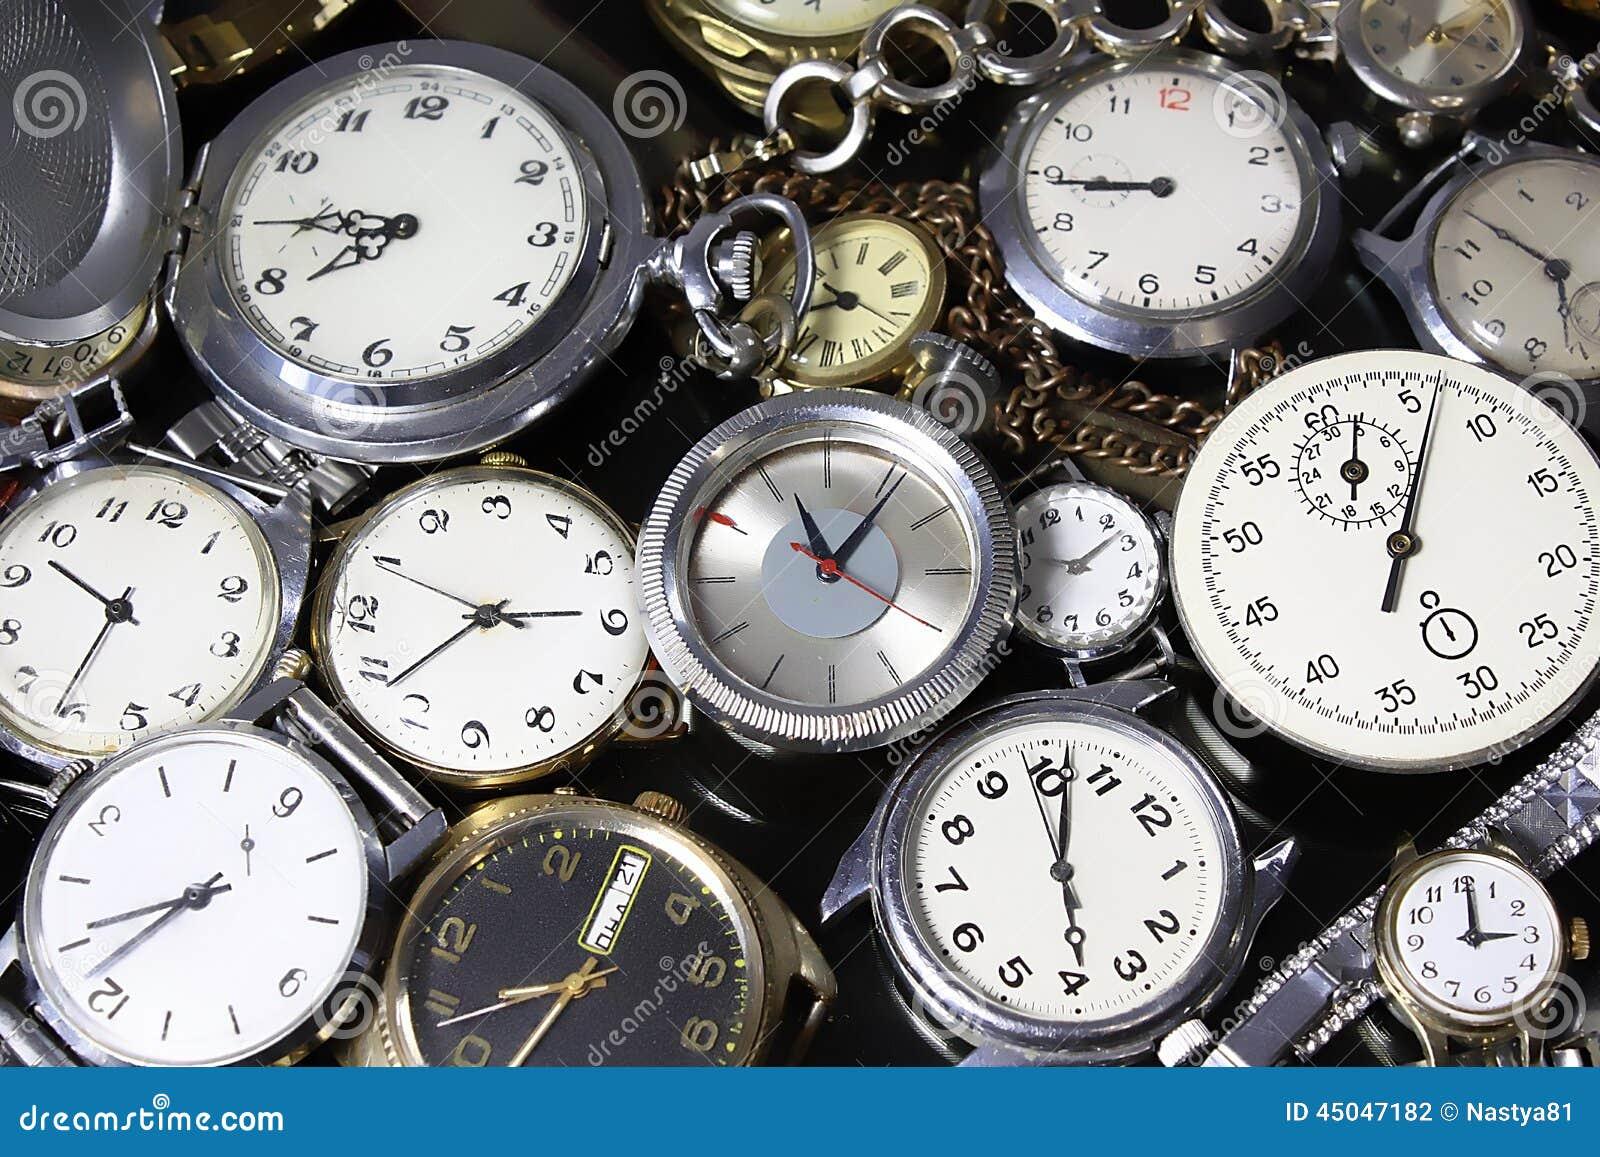 Background Watches Stock Photo Image 45047182